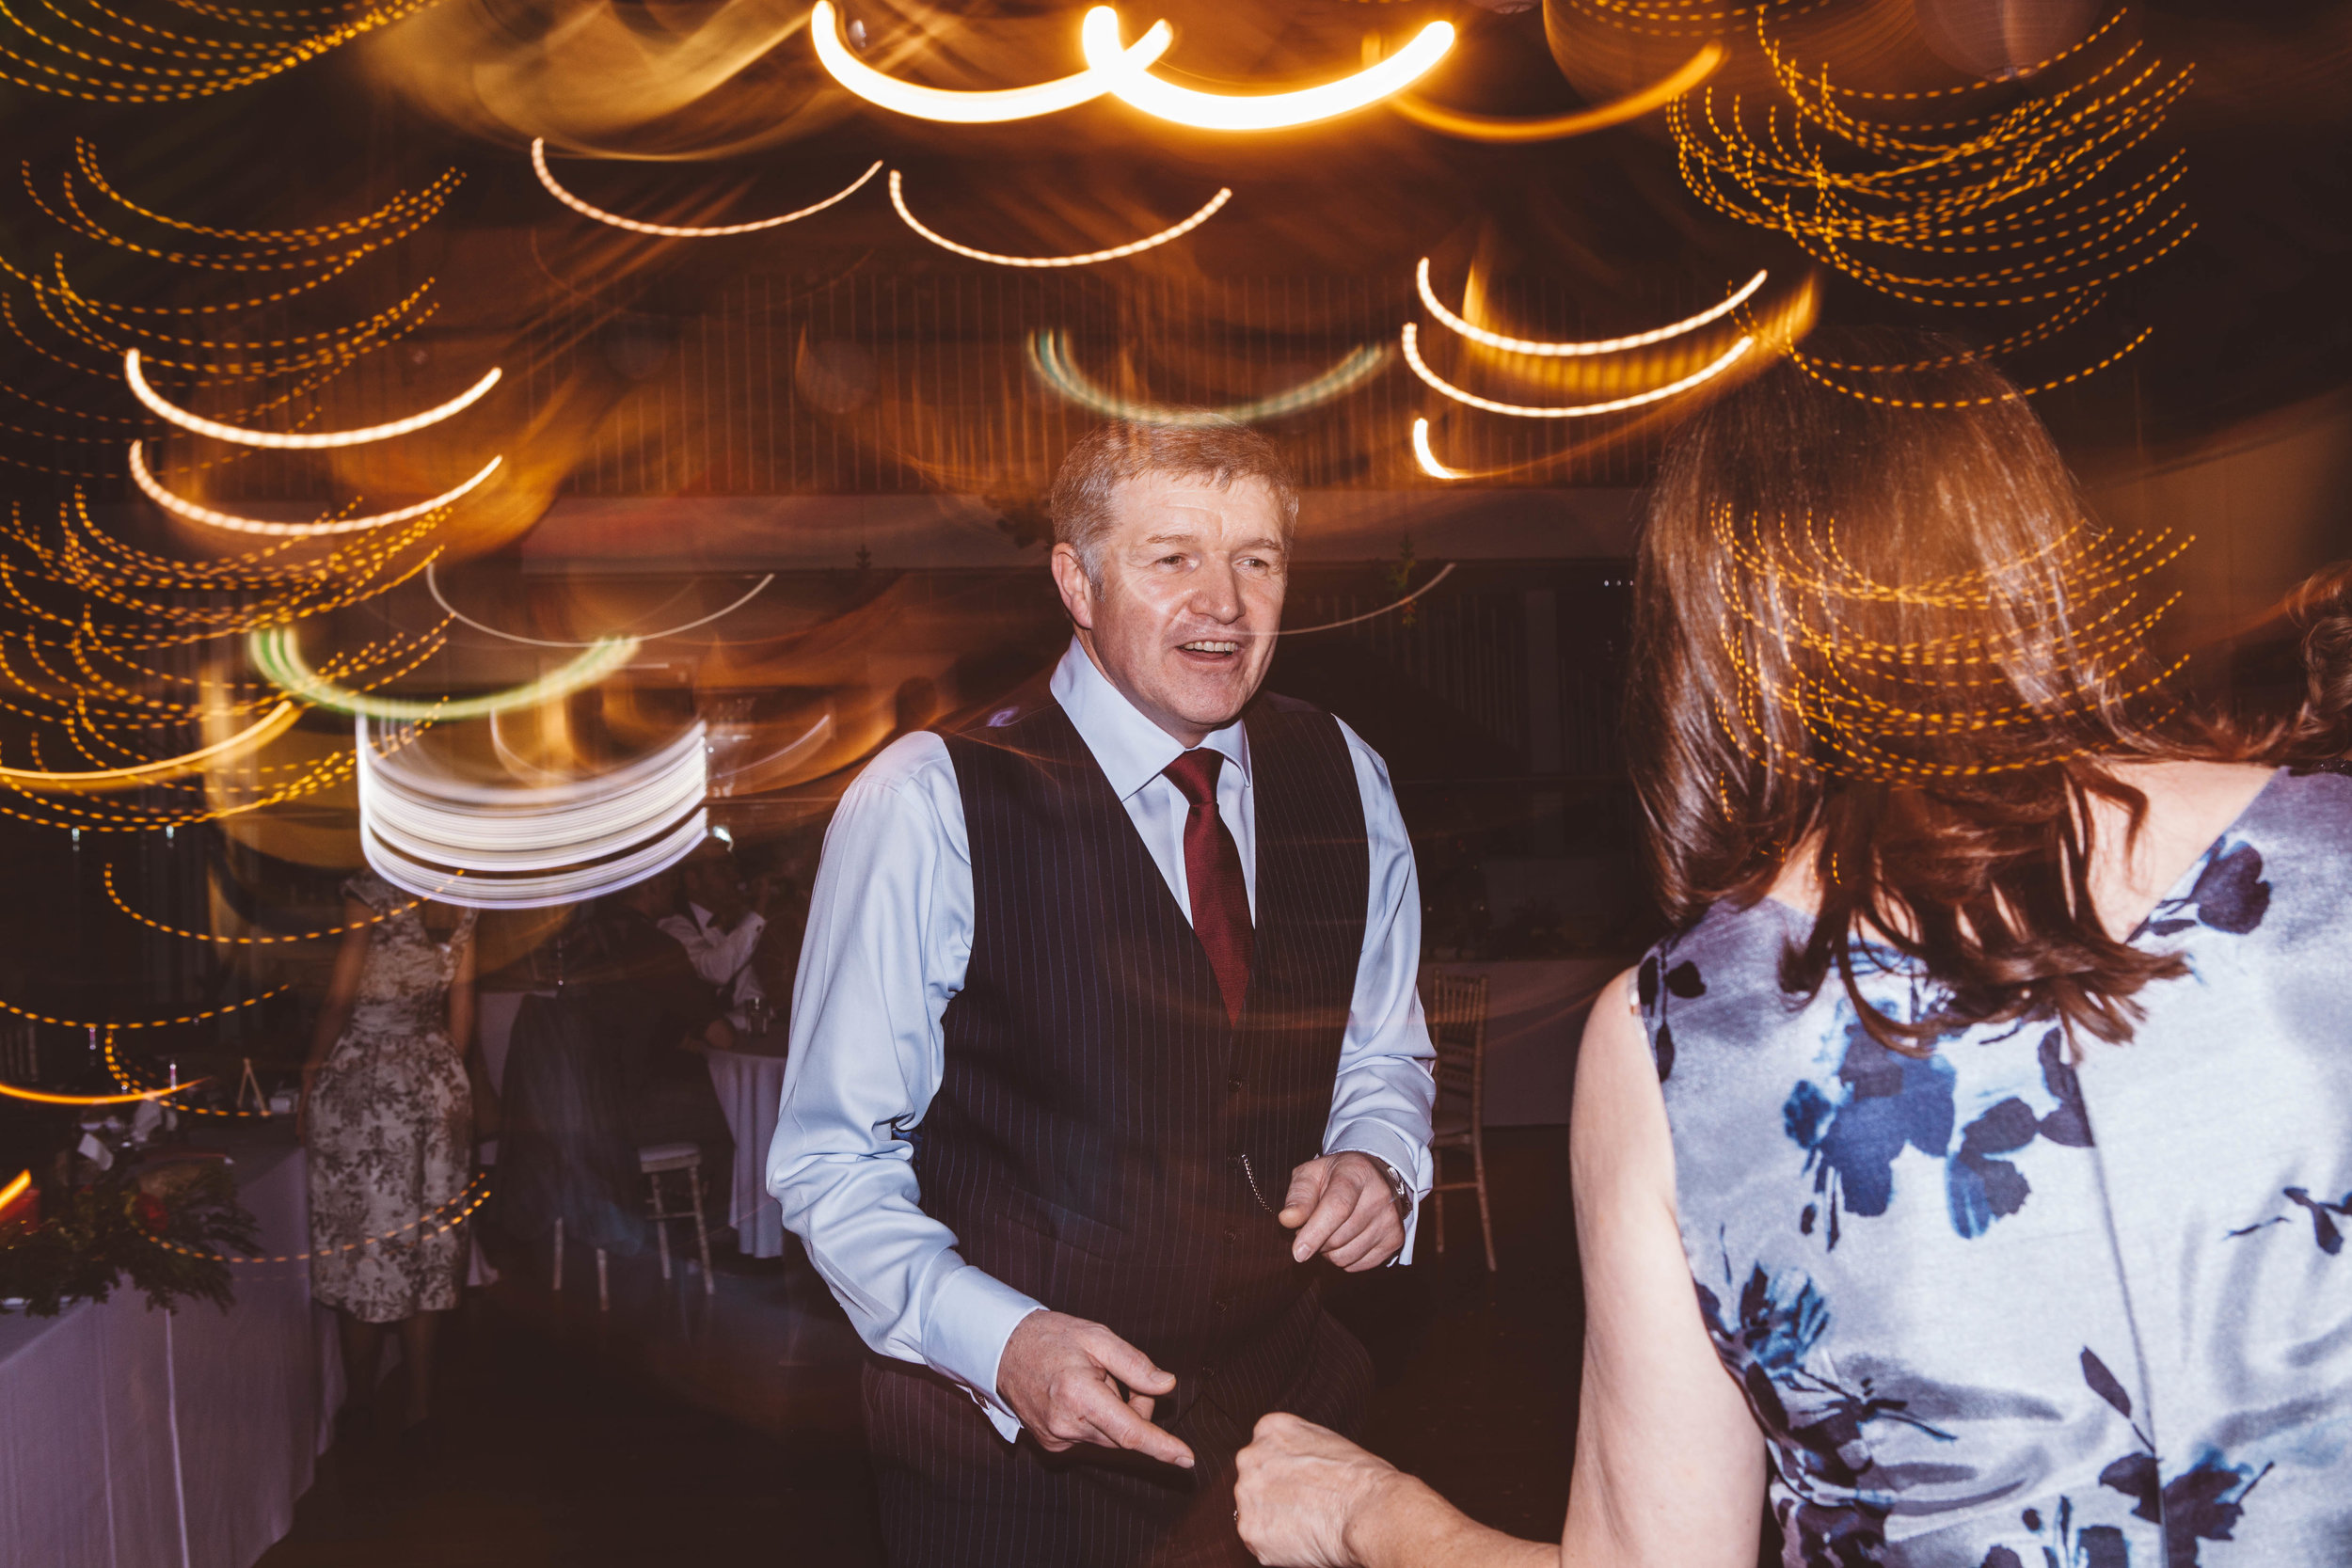 The-Northorpe-Barn-Wedding-Photography-2017-12.jpg